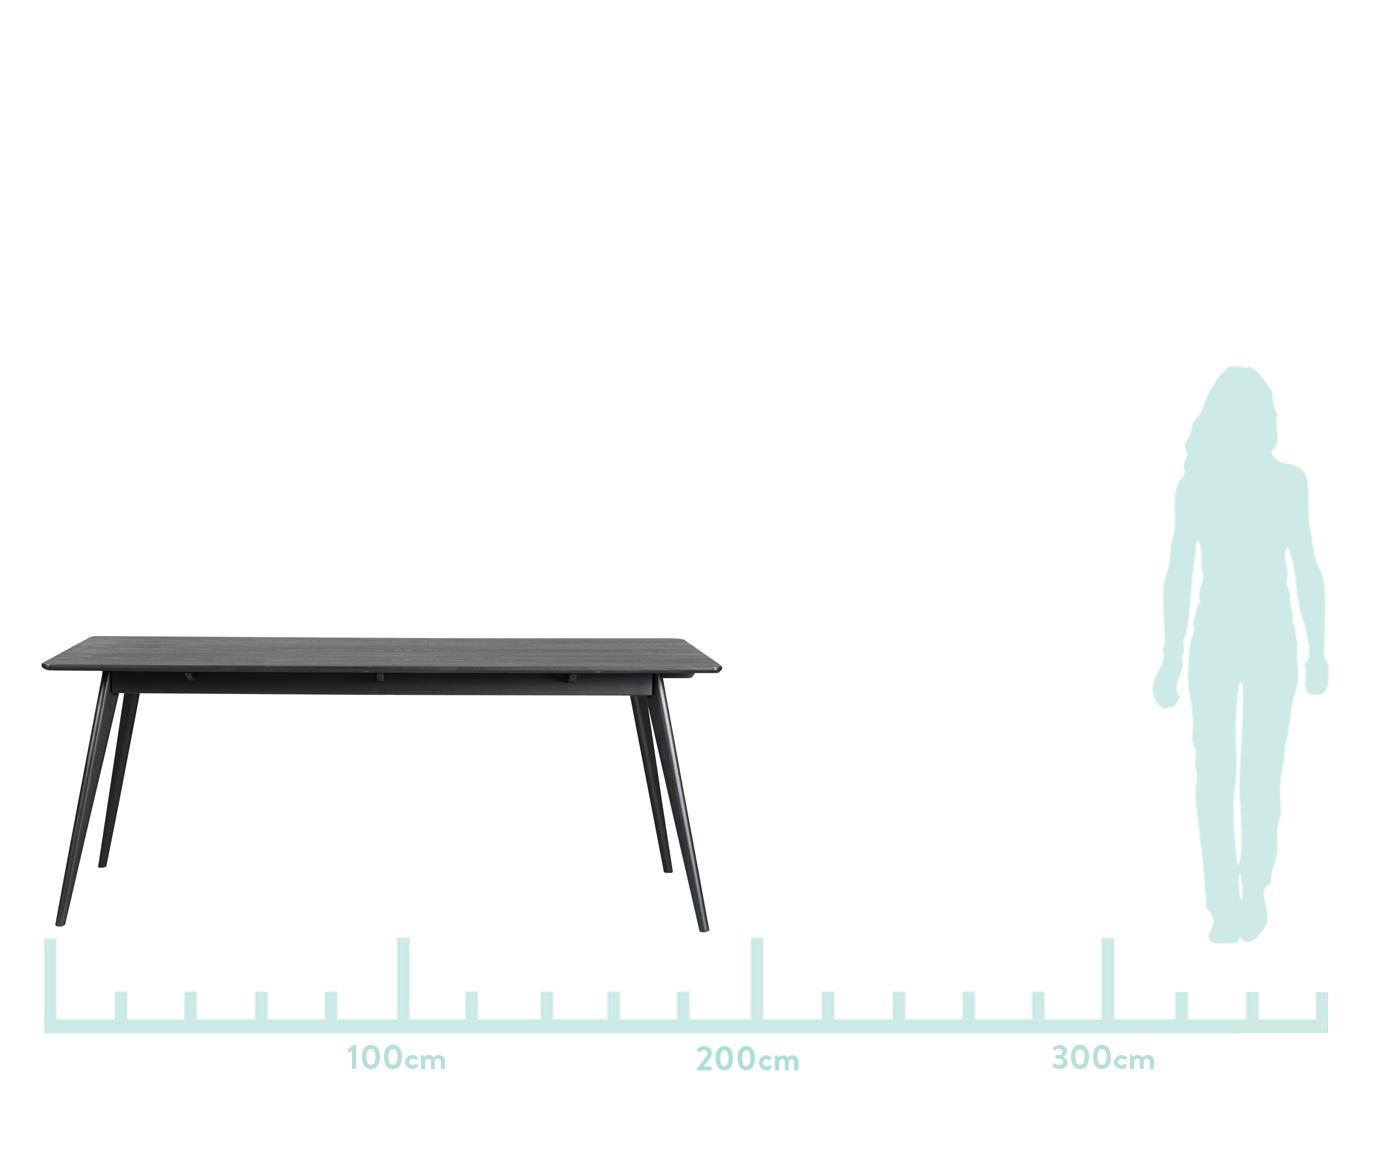 Table bois style scandinave Yumi, Noir, mat